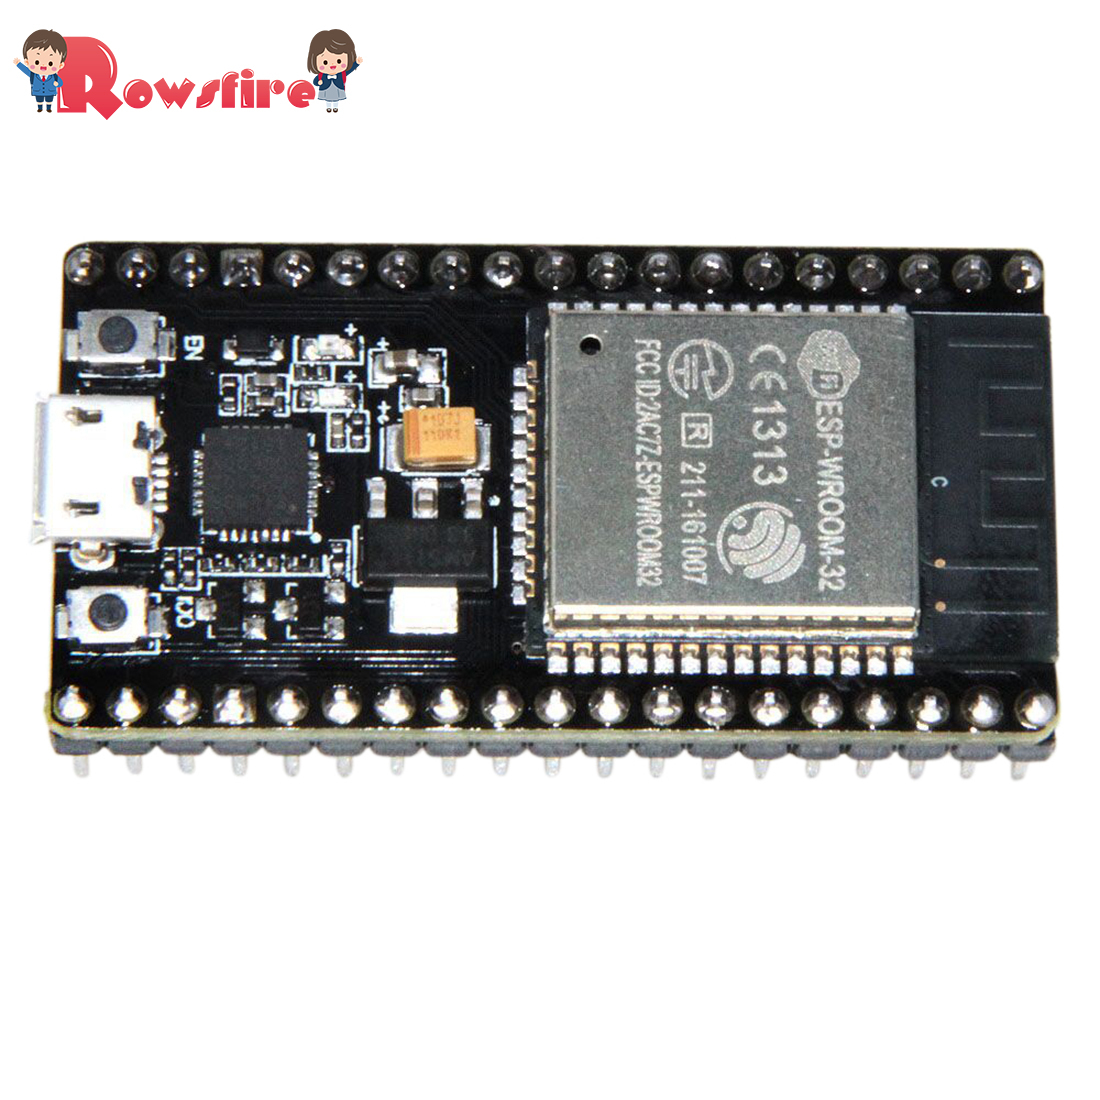 Wireless Wifi Bluetooth 2-In-1 Dicaryon CPU Low-Power Dissipation ESP32 Development Board